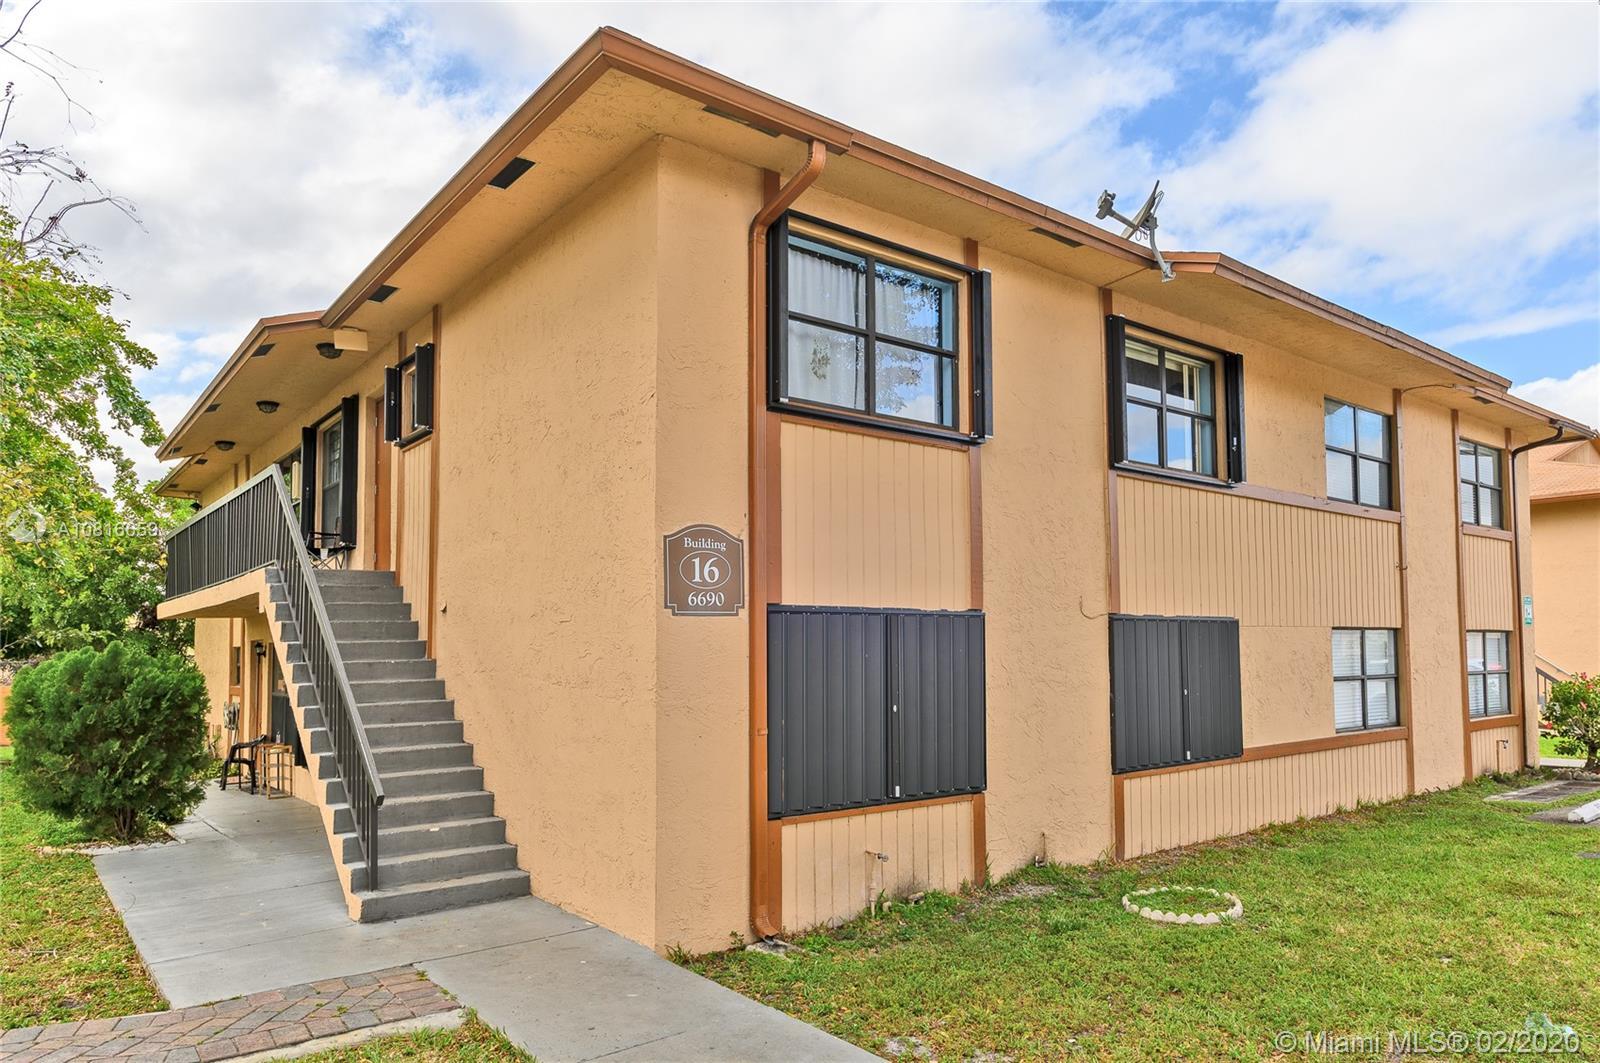 6690 W 26th Ct #23-16 Property Photo